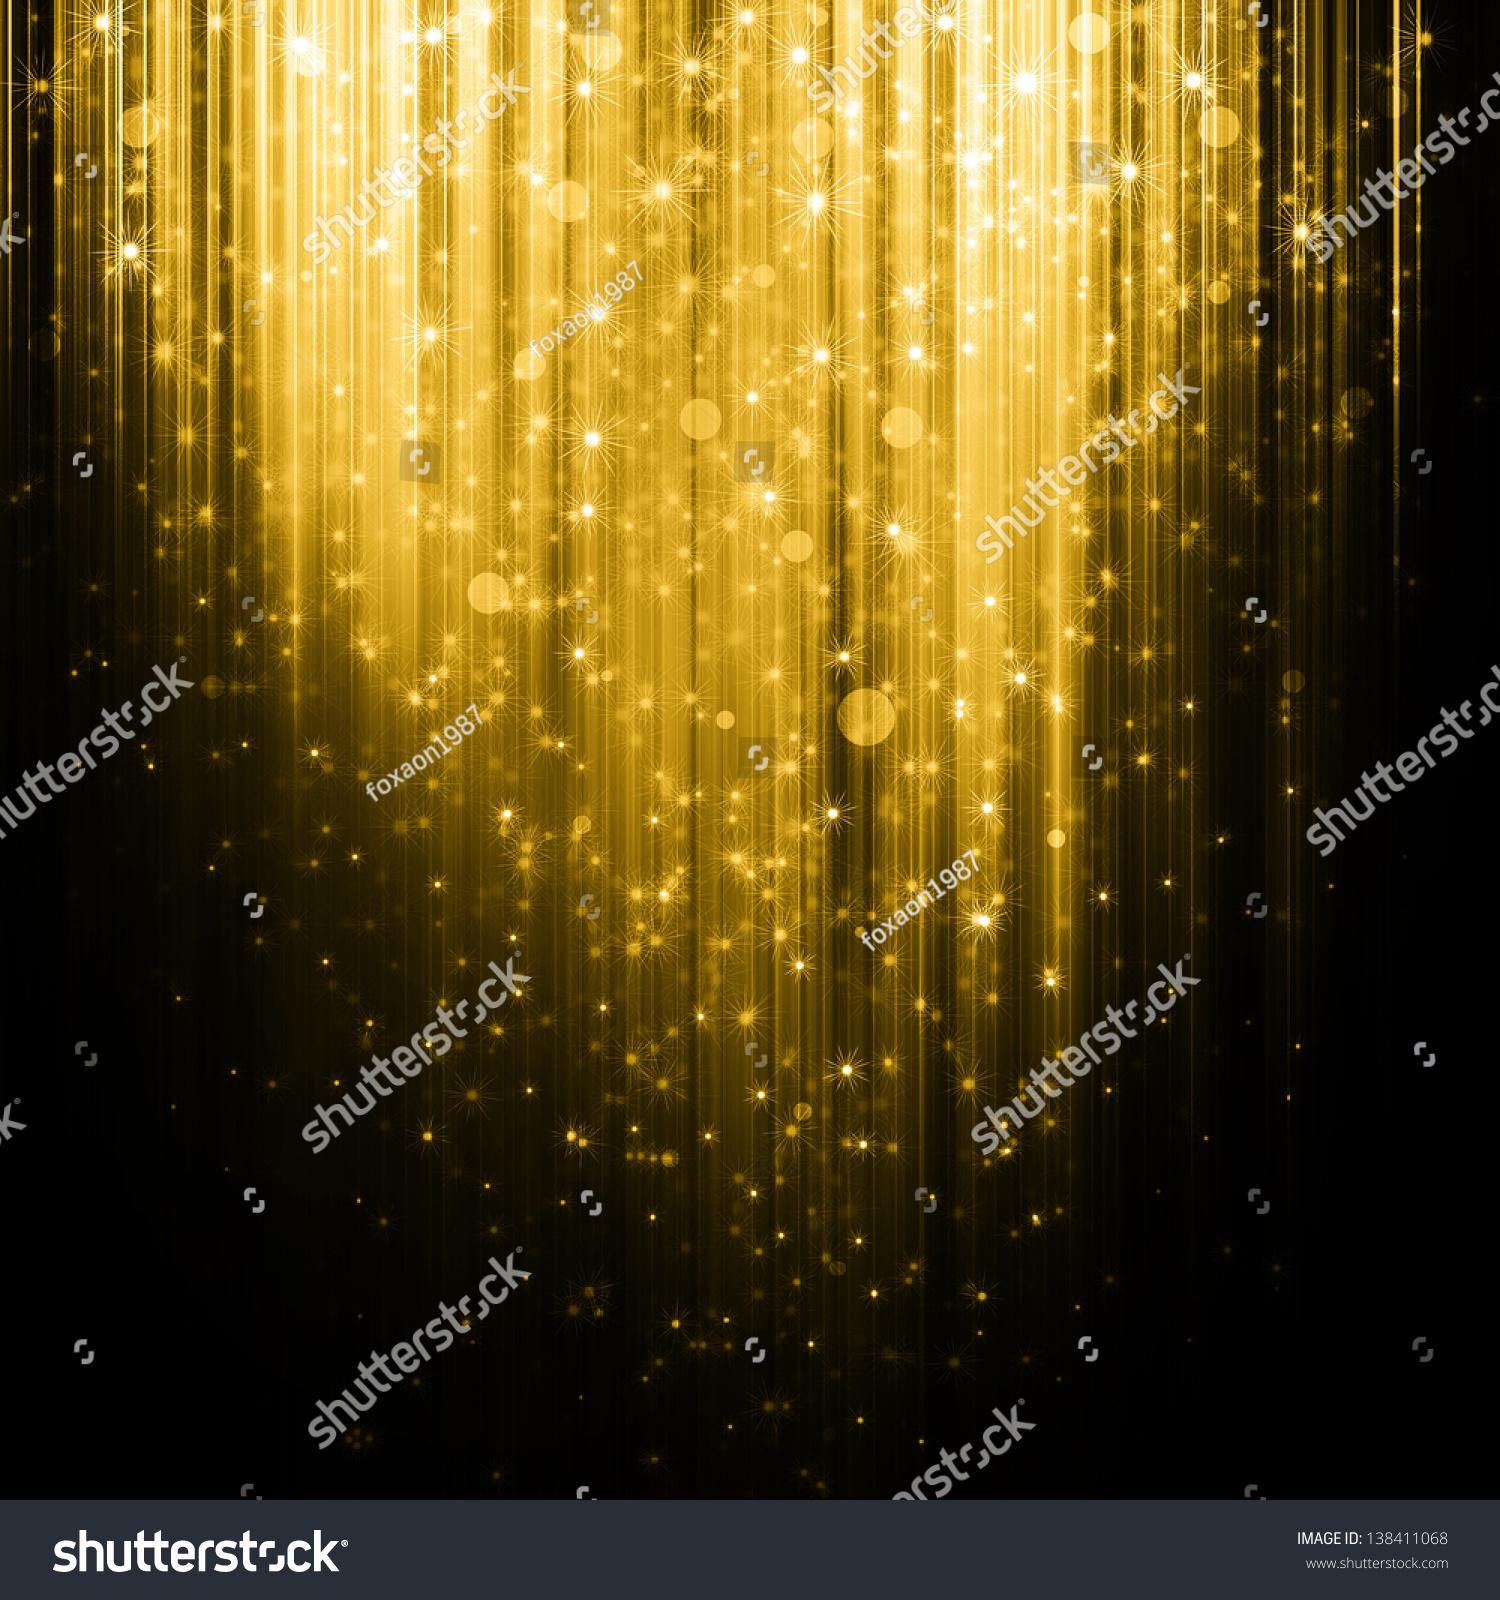 shiny golden lights stock - photo #4